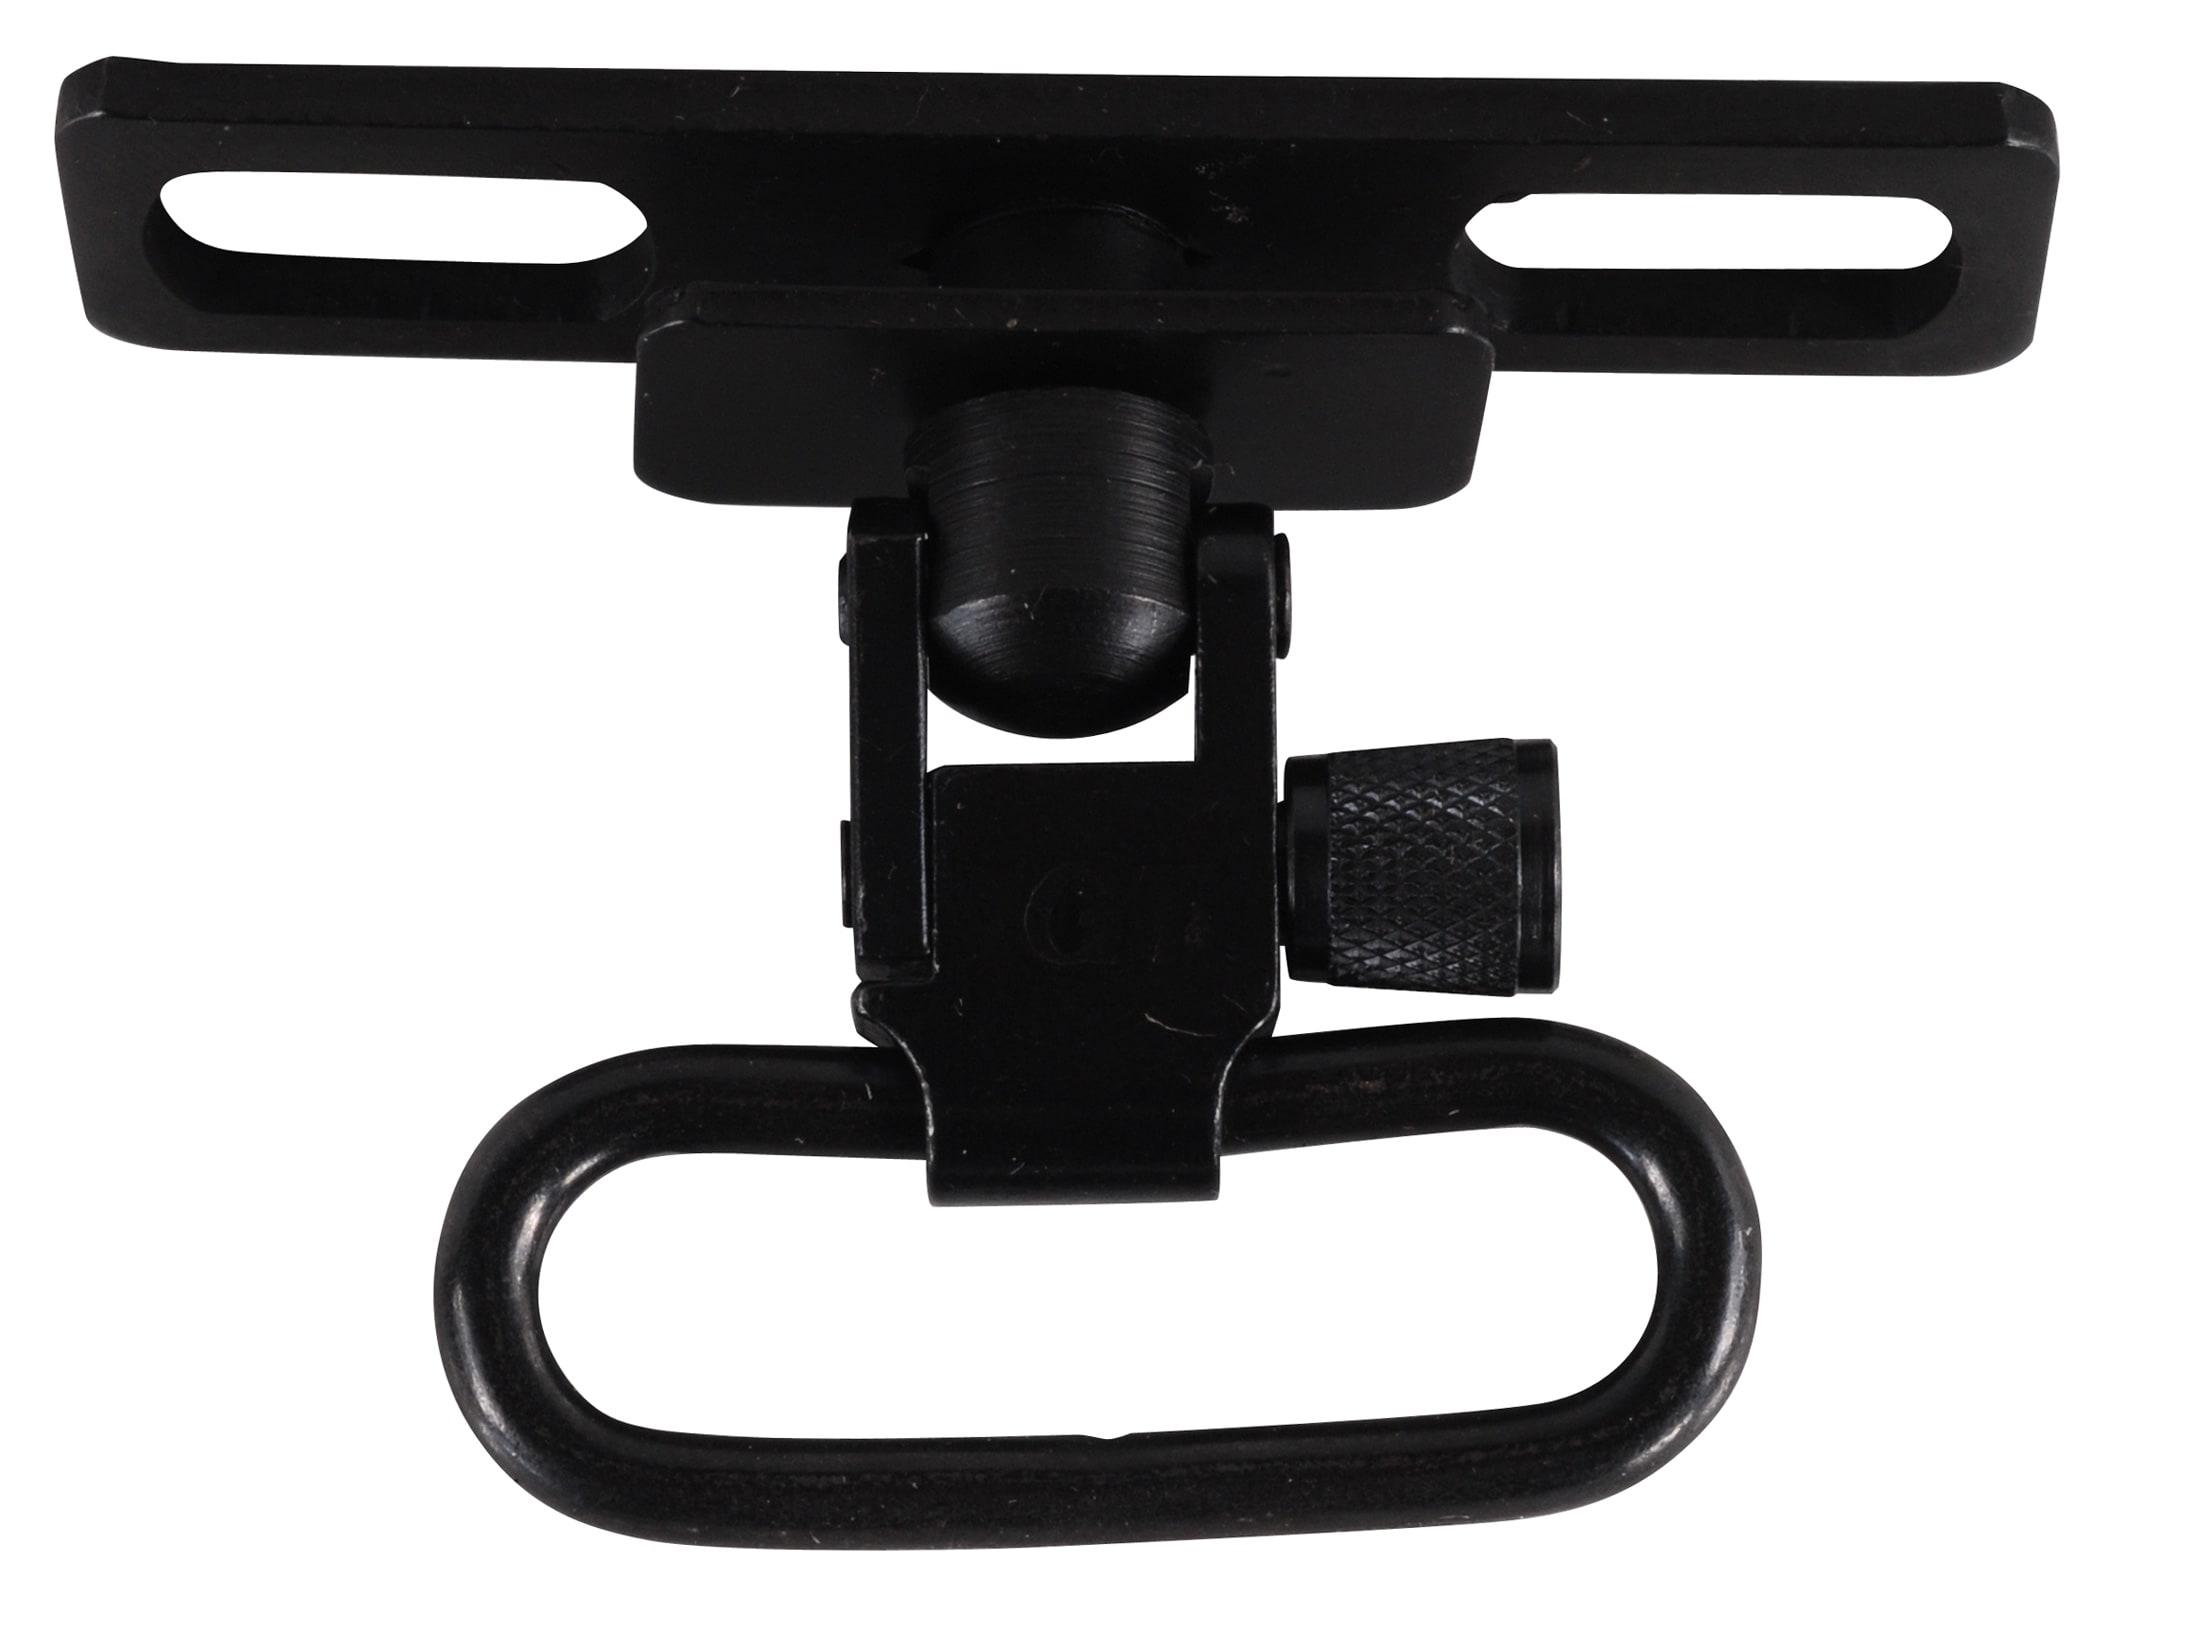 Harris Bipods  Bipod Stud Adapter Fits 3/8 Rails Black # 6 Sporting Goods